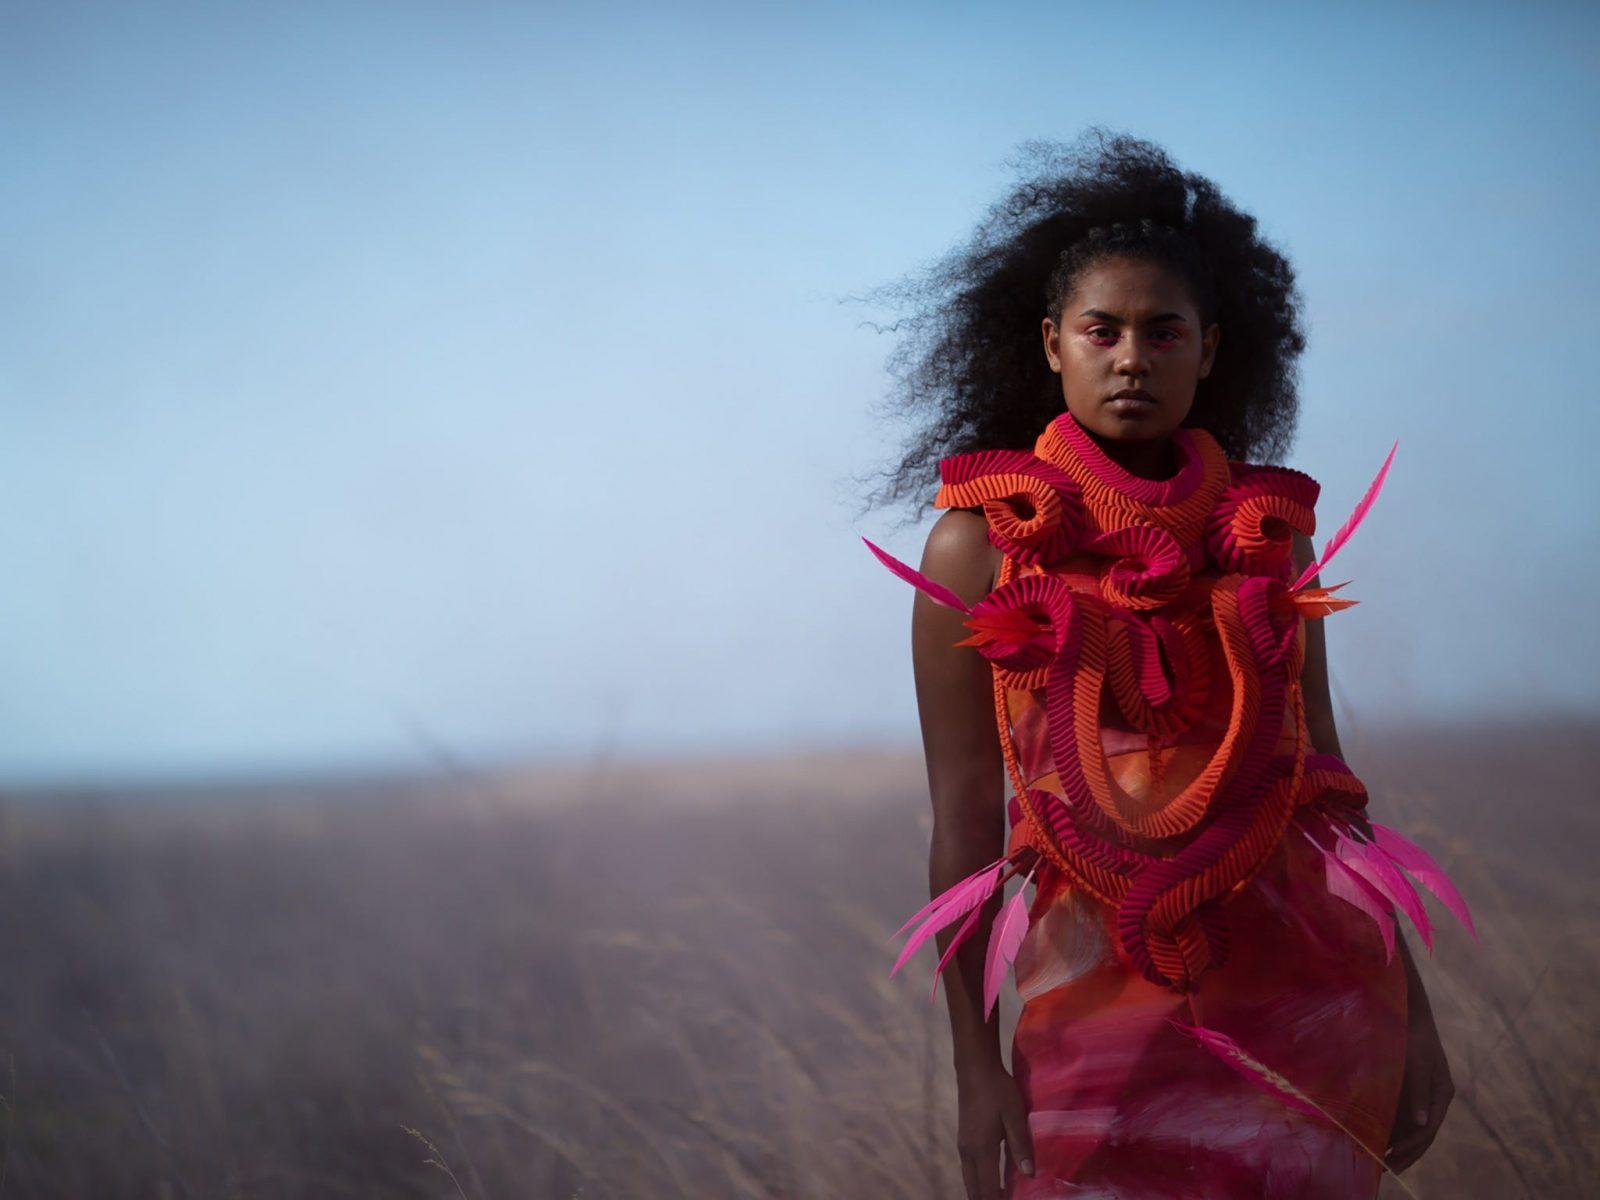 Model - Shantel Miskin, Photographer- Wade Lewis, Videographer -Chris Baker, Assistant - Darrin Walk